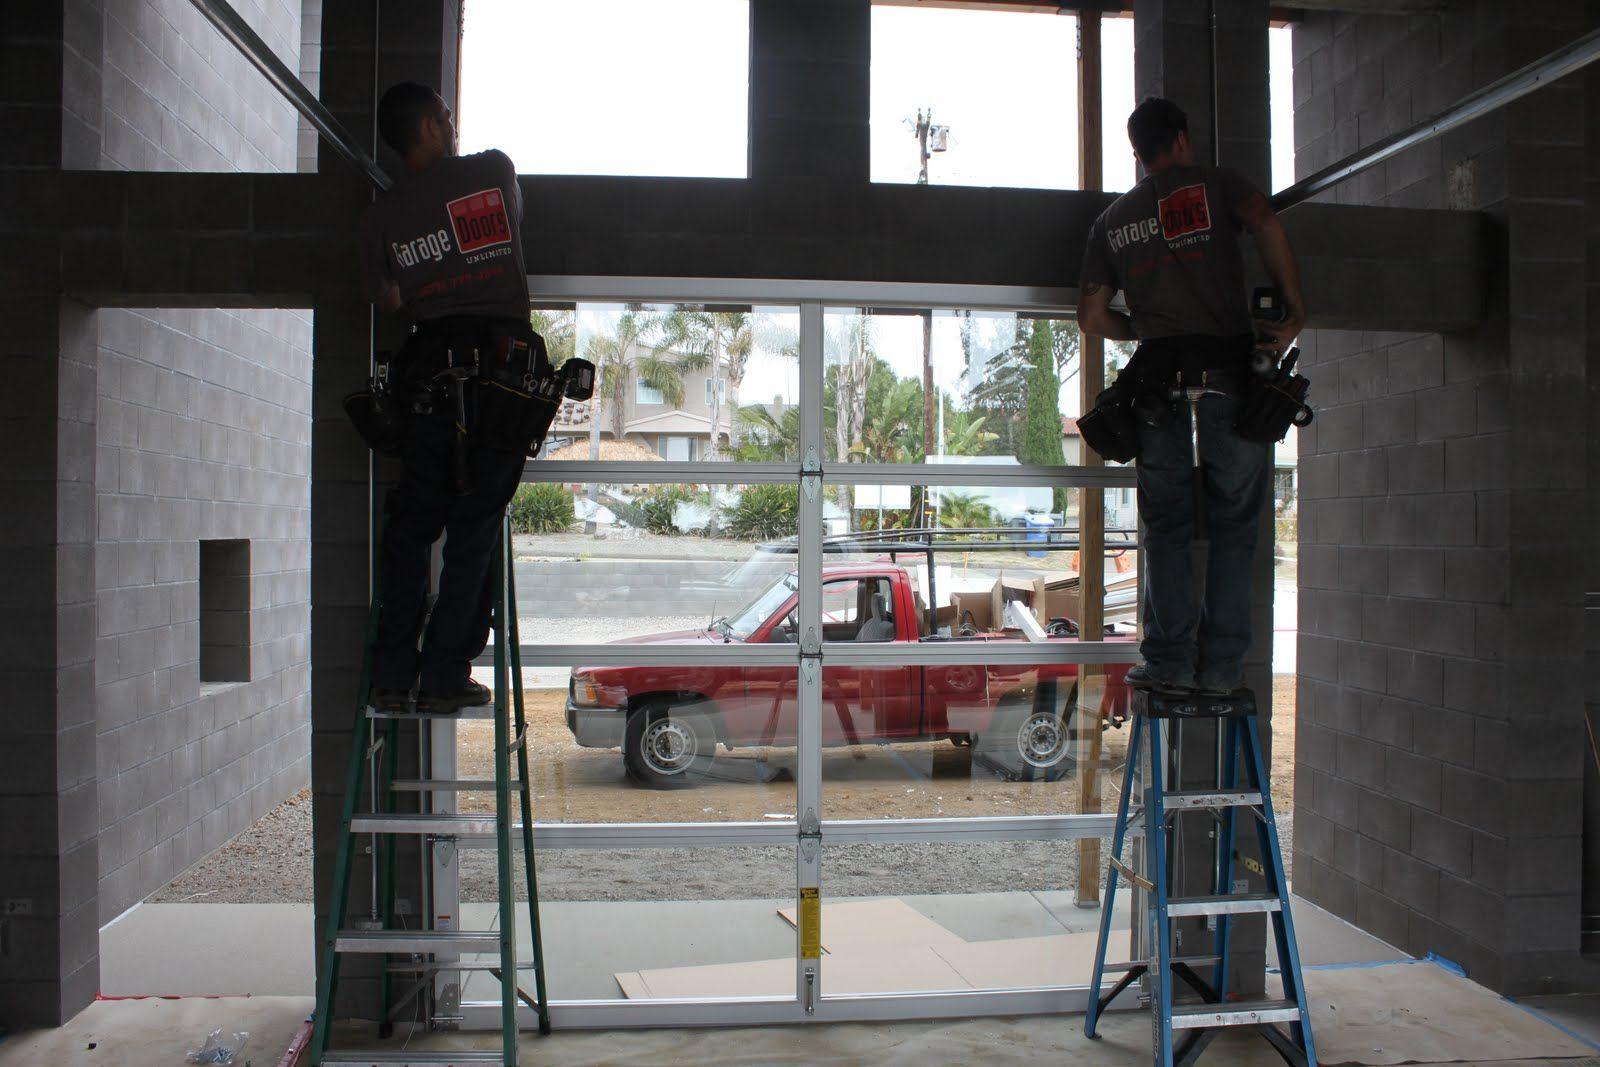 Glass garage doors restaurant - Aluminum Full View Glass Garage Doors On Restaurant Garage Doors Unlimited 3 U0027s A Crowd